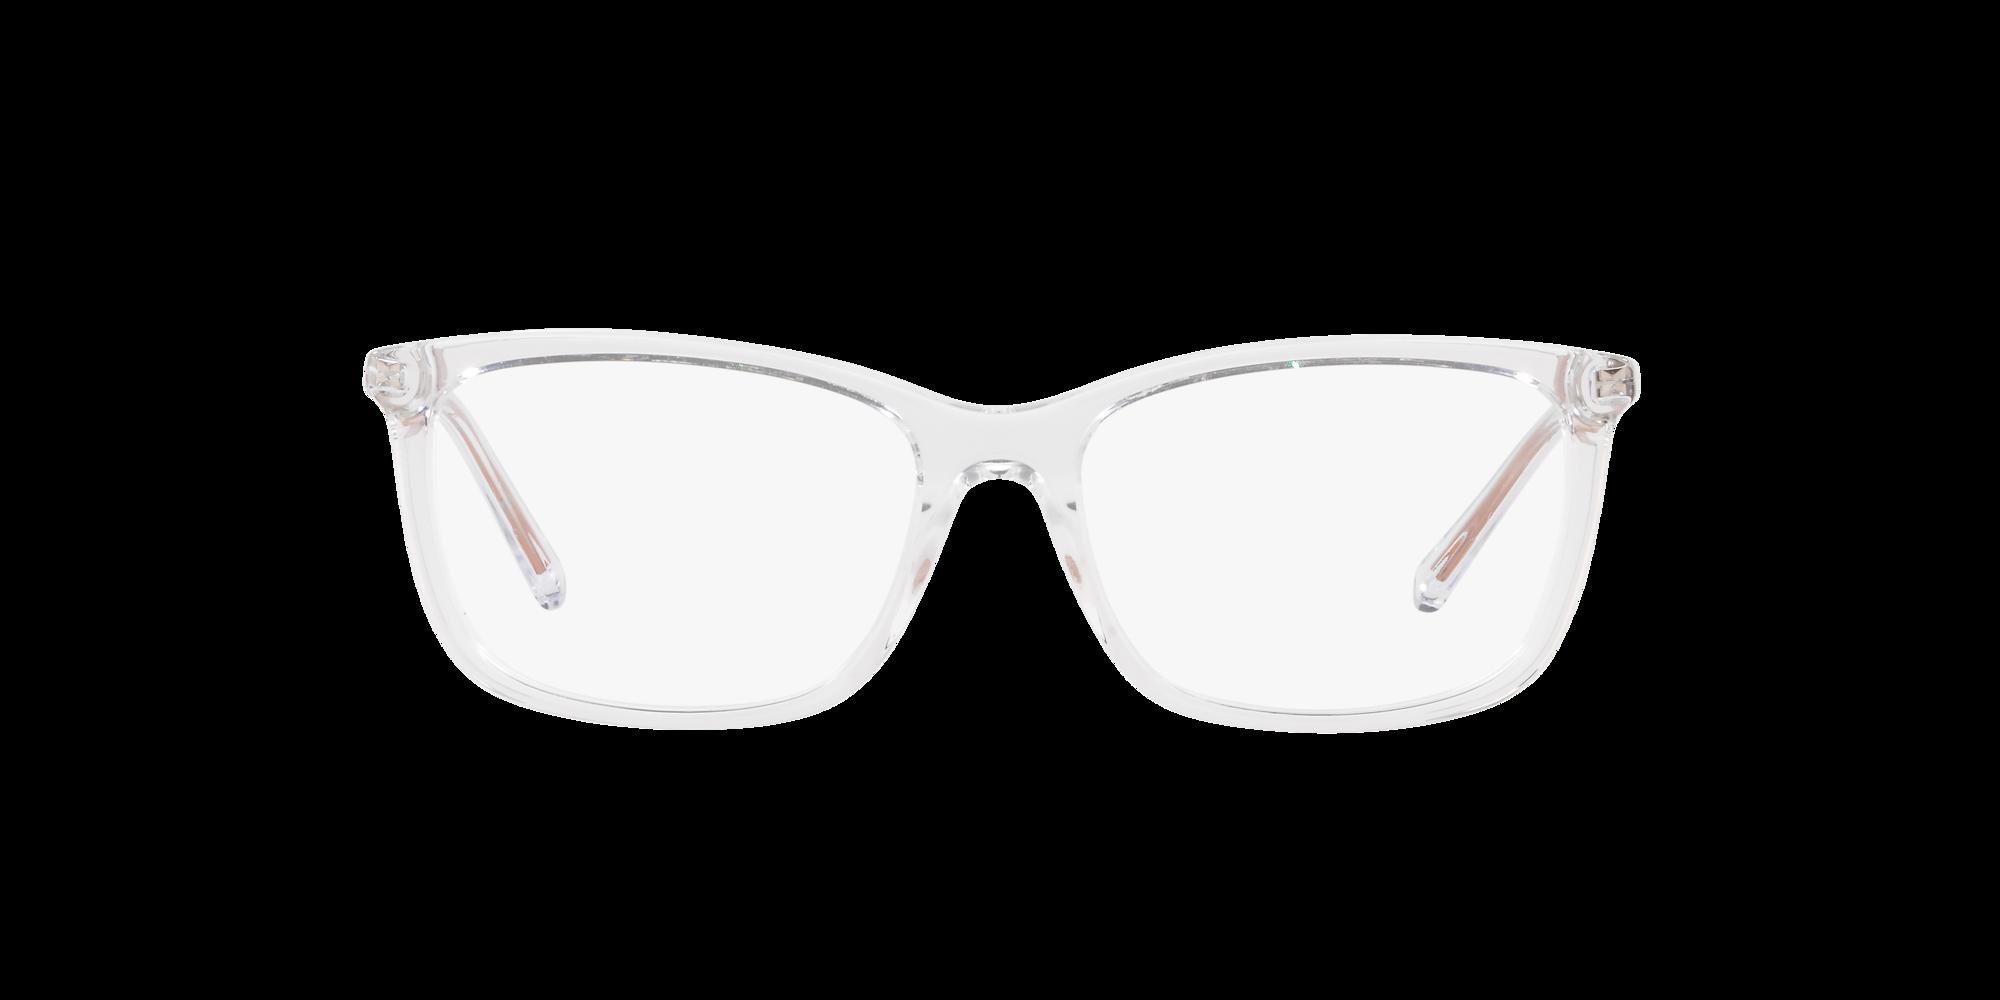 Image for MK4030 VIVIANNA II from LensCrafters | Glasses, Prescription Glasses Online, Eyewear